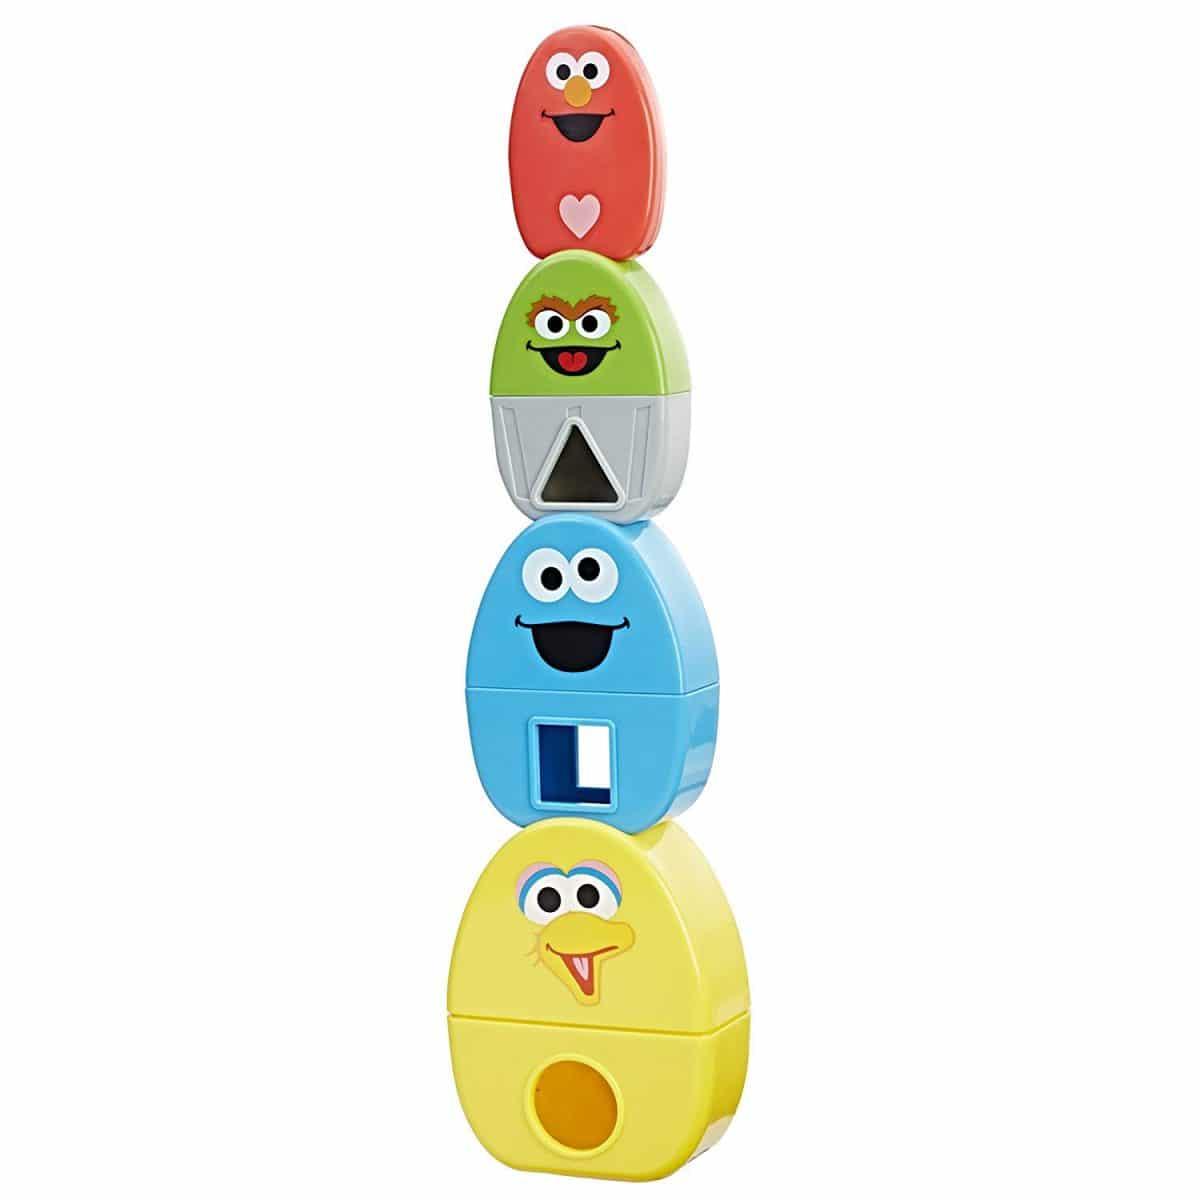 Stacking//Nesting Cups BPA Free Sesame Street